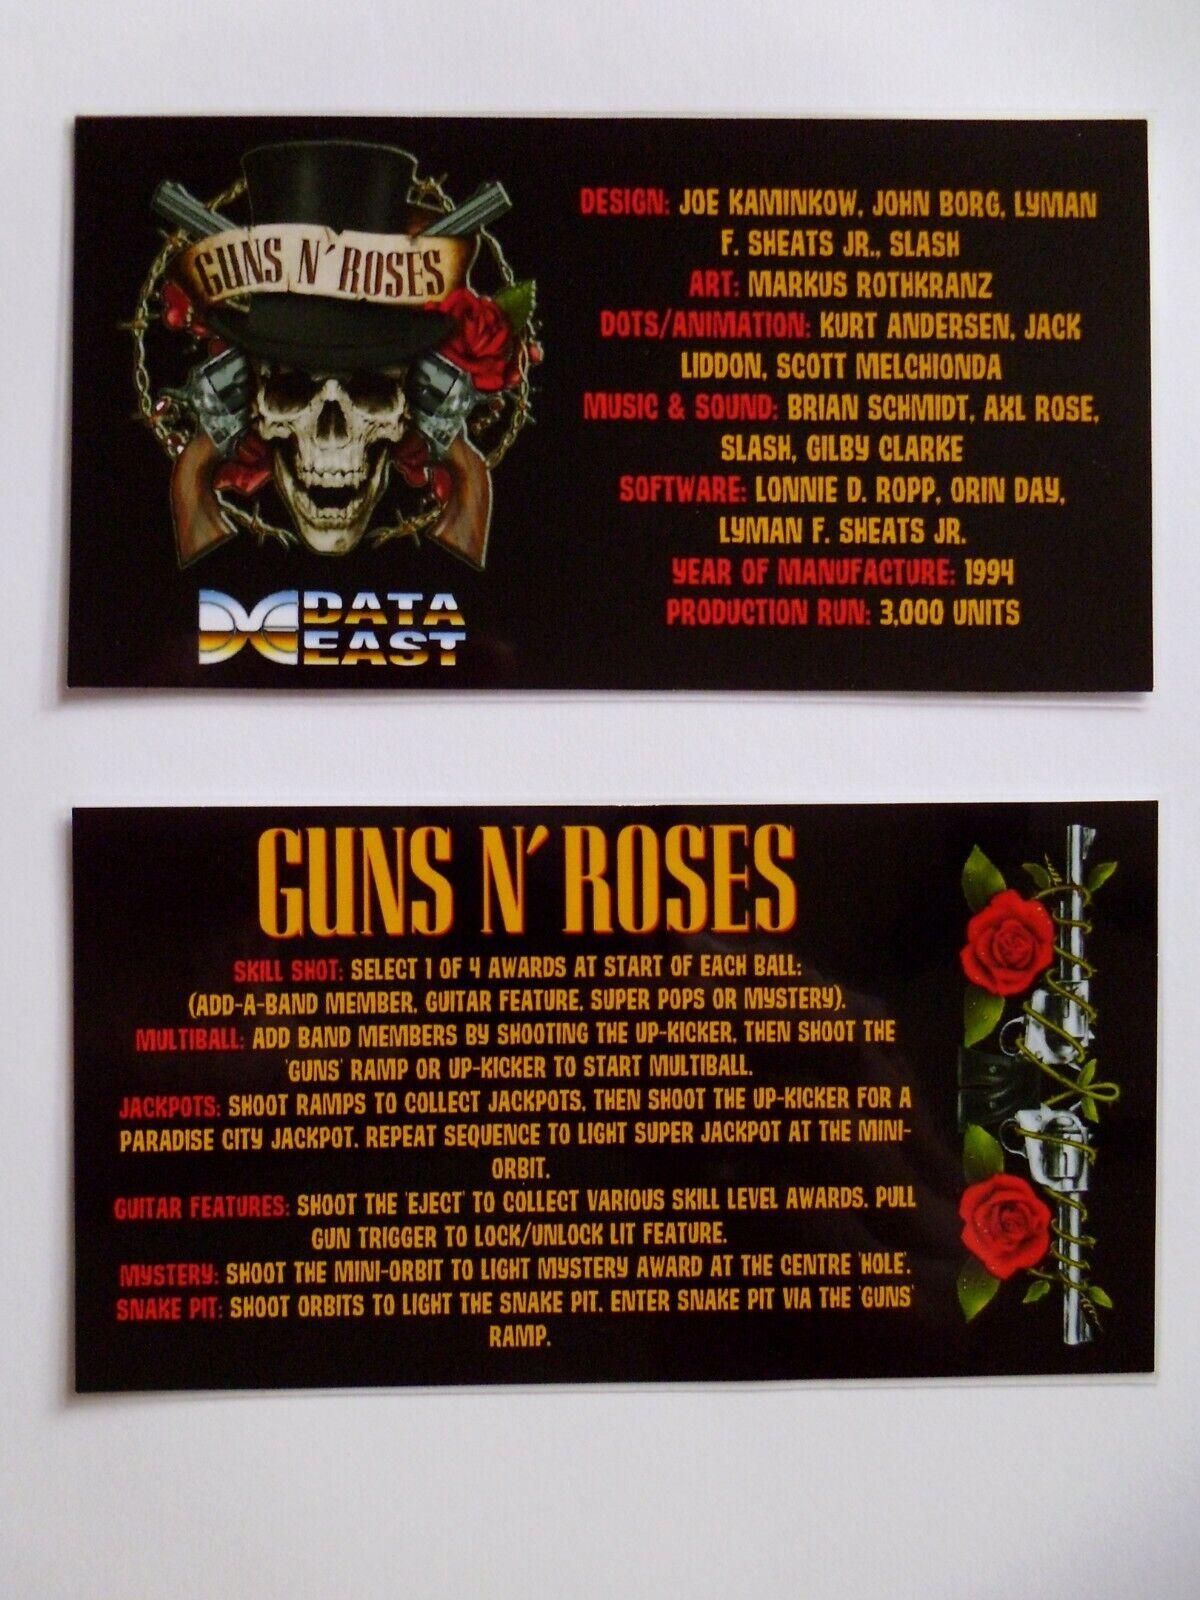 * * 'GUNS 'N' ROSES' Data East 1994 Custom Instruction/Apron Cards (New) * *